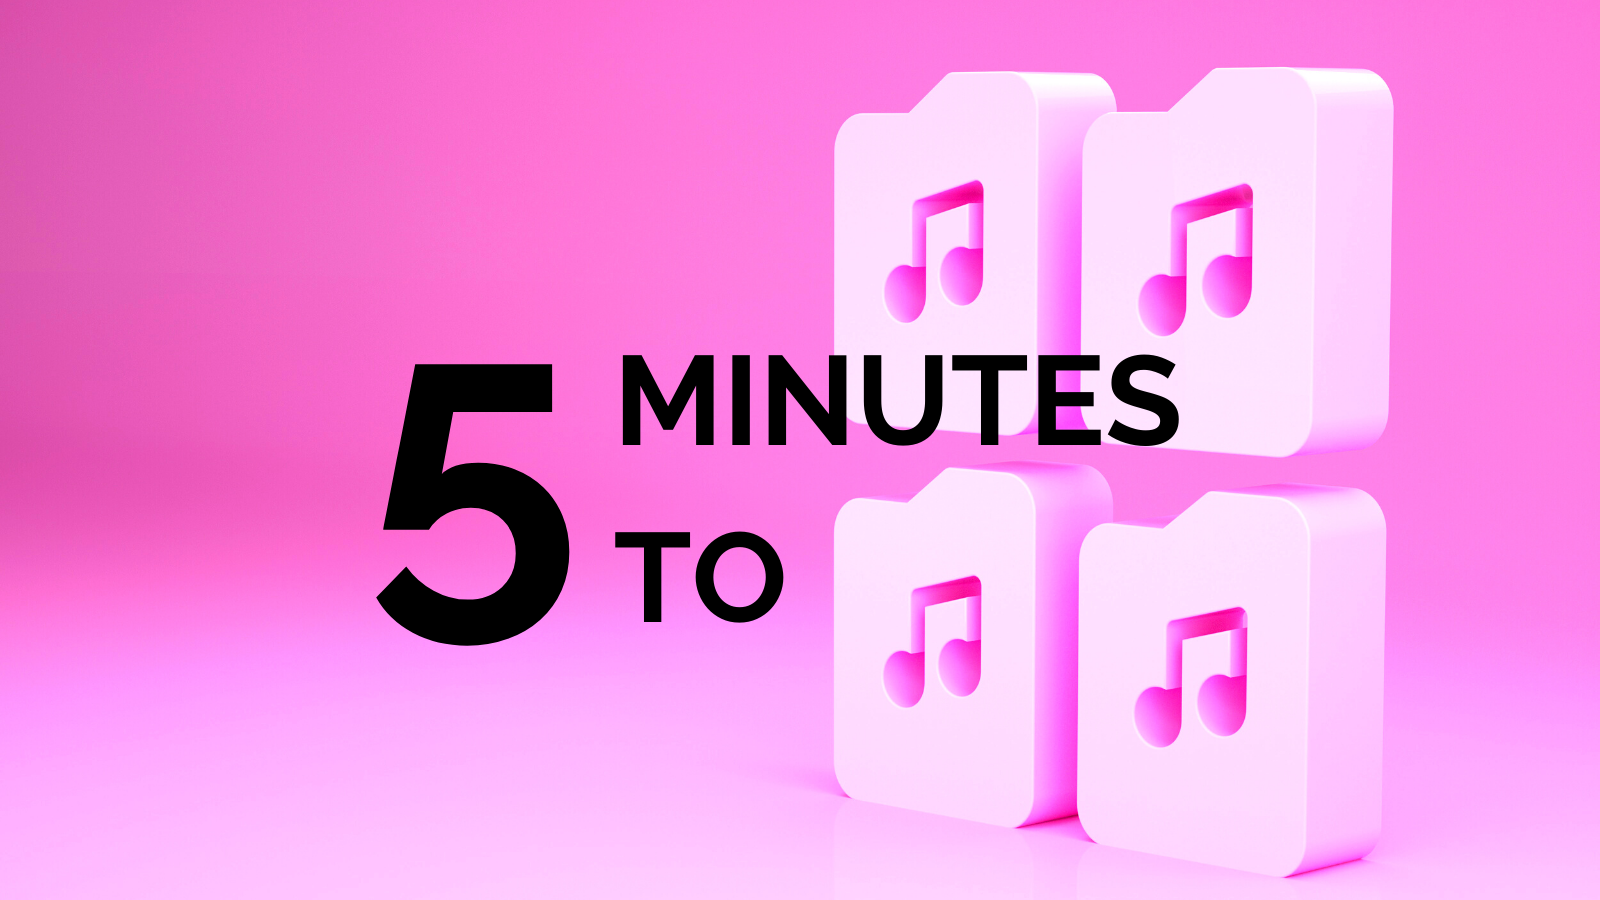 5 Minutes To: Immersive Audio